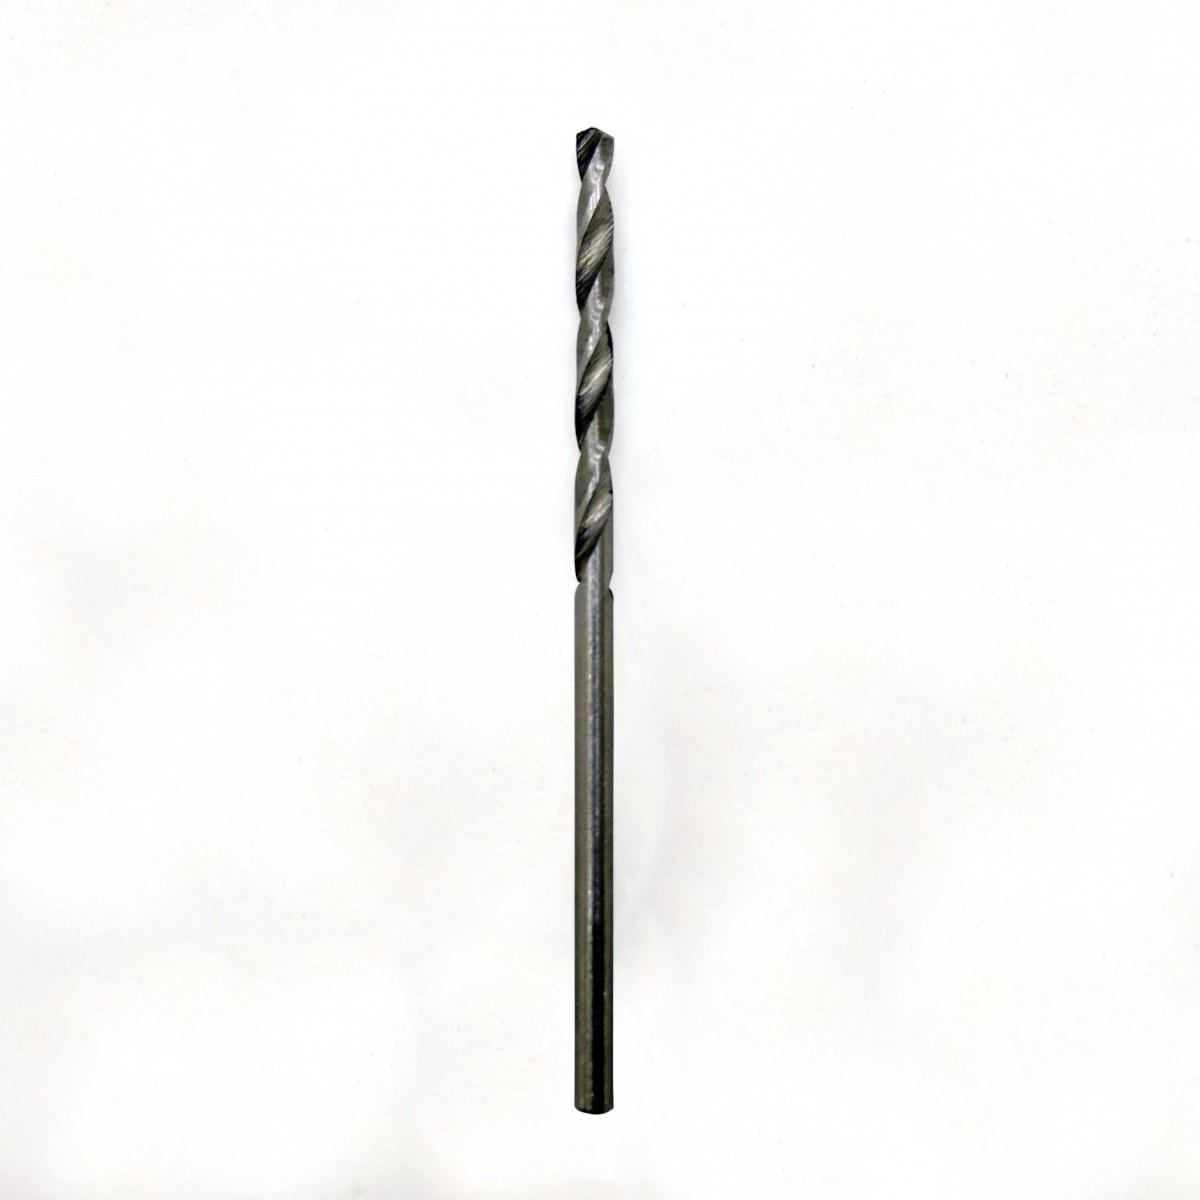 Broca Helicoidal Cilíndrica Rocast - Hss 2mm Din 338 - Bh24